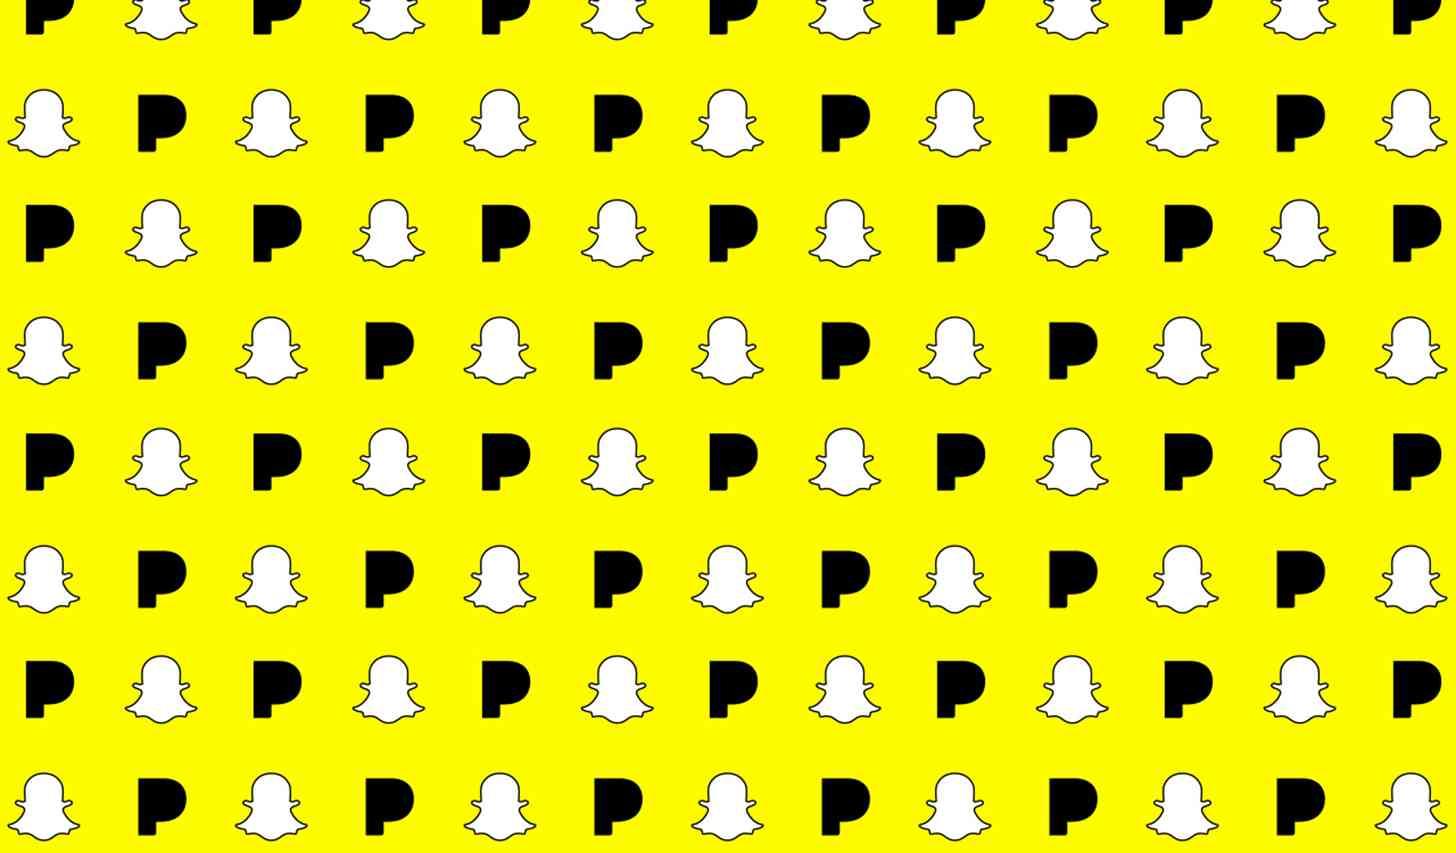 Snapchat Pandora integration